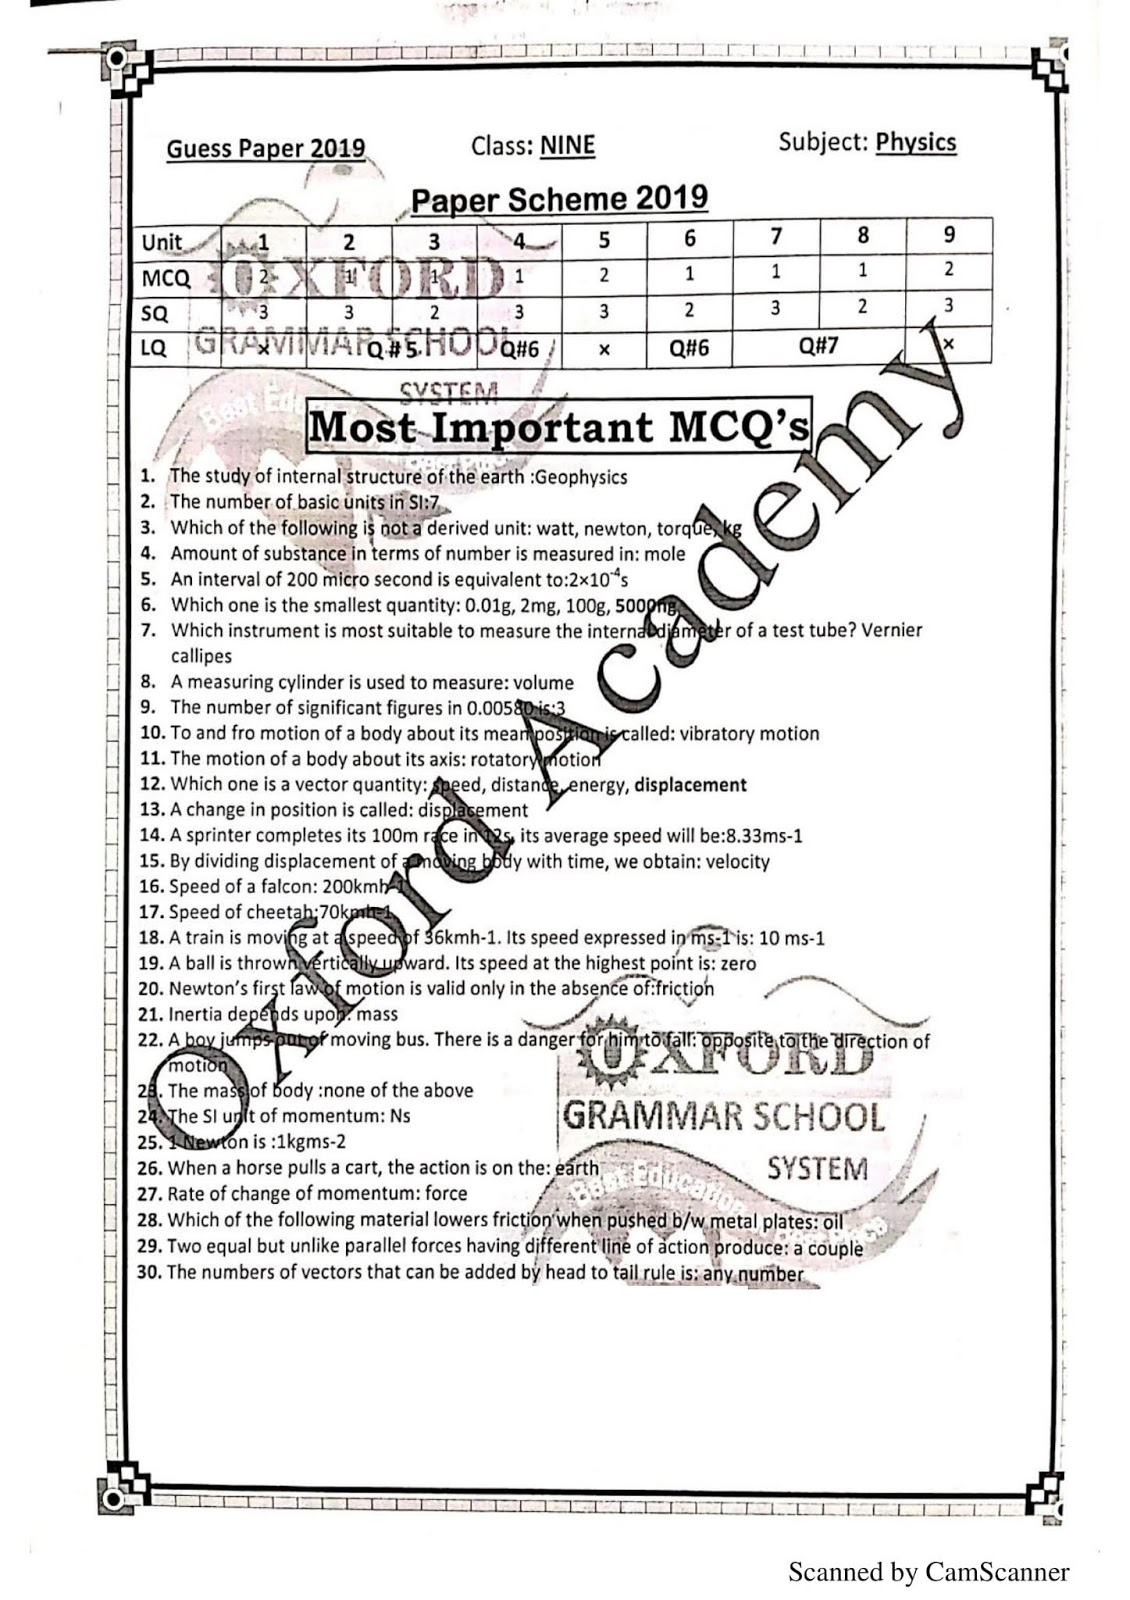 Physics 9th Class Guess 2019 ~ Sadaqat Academy